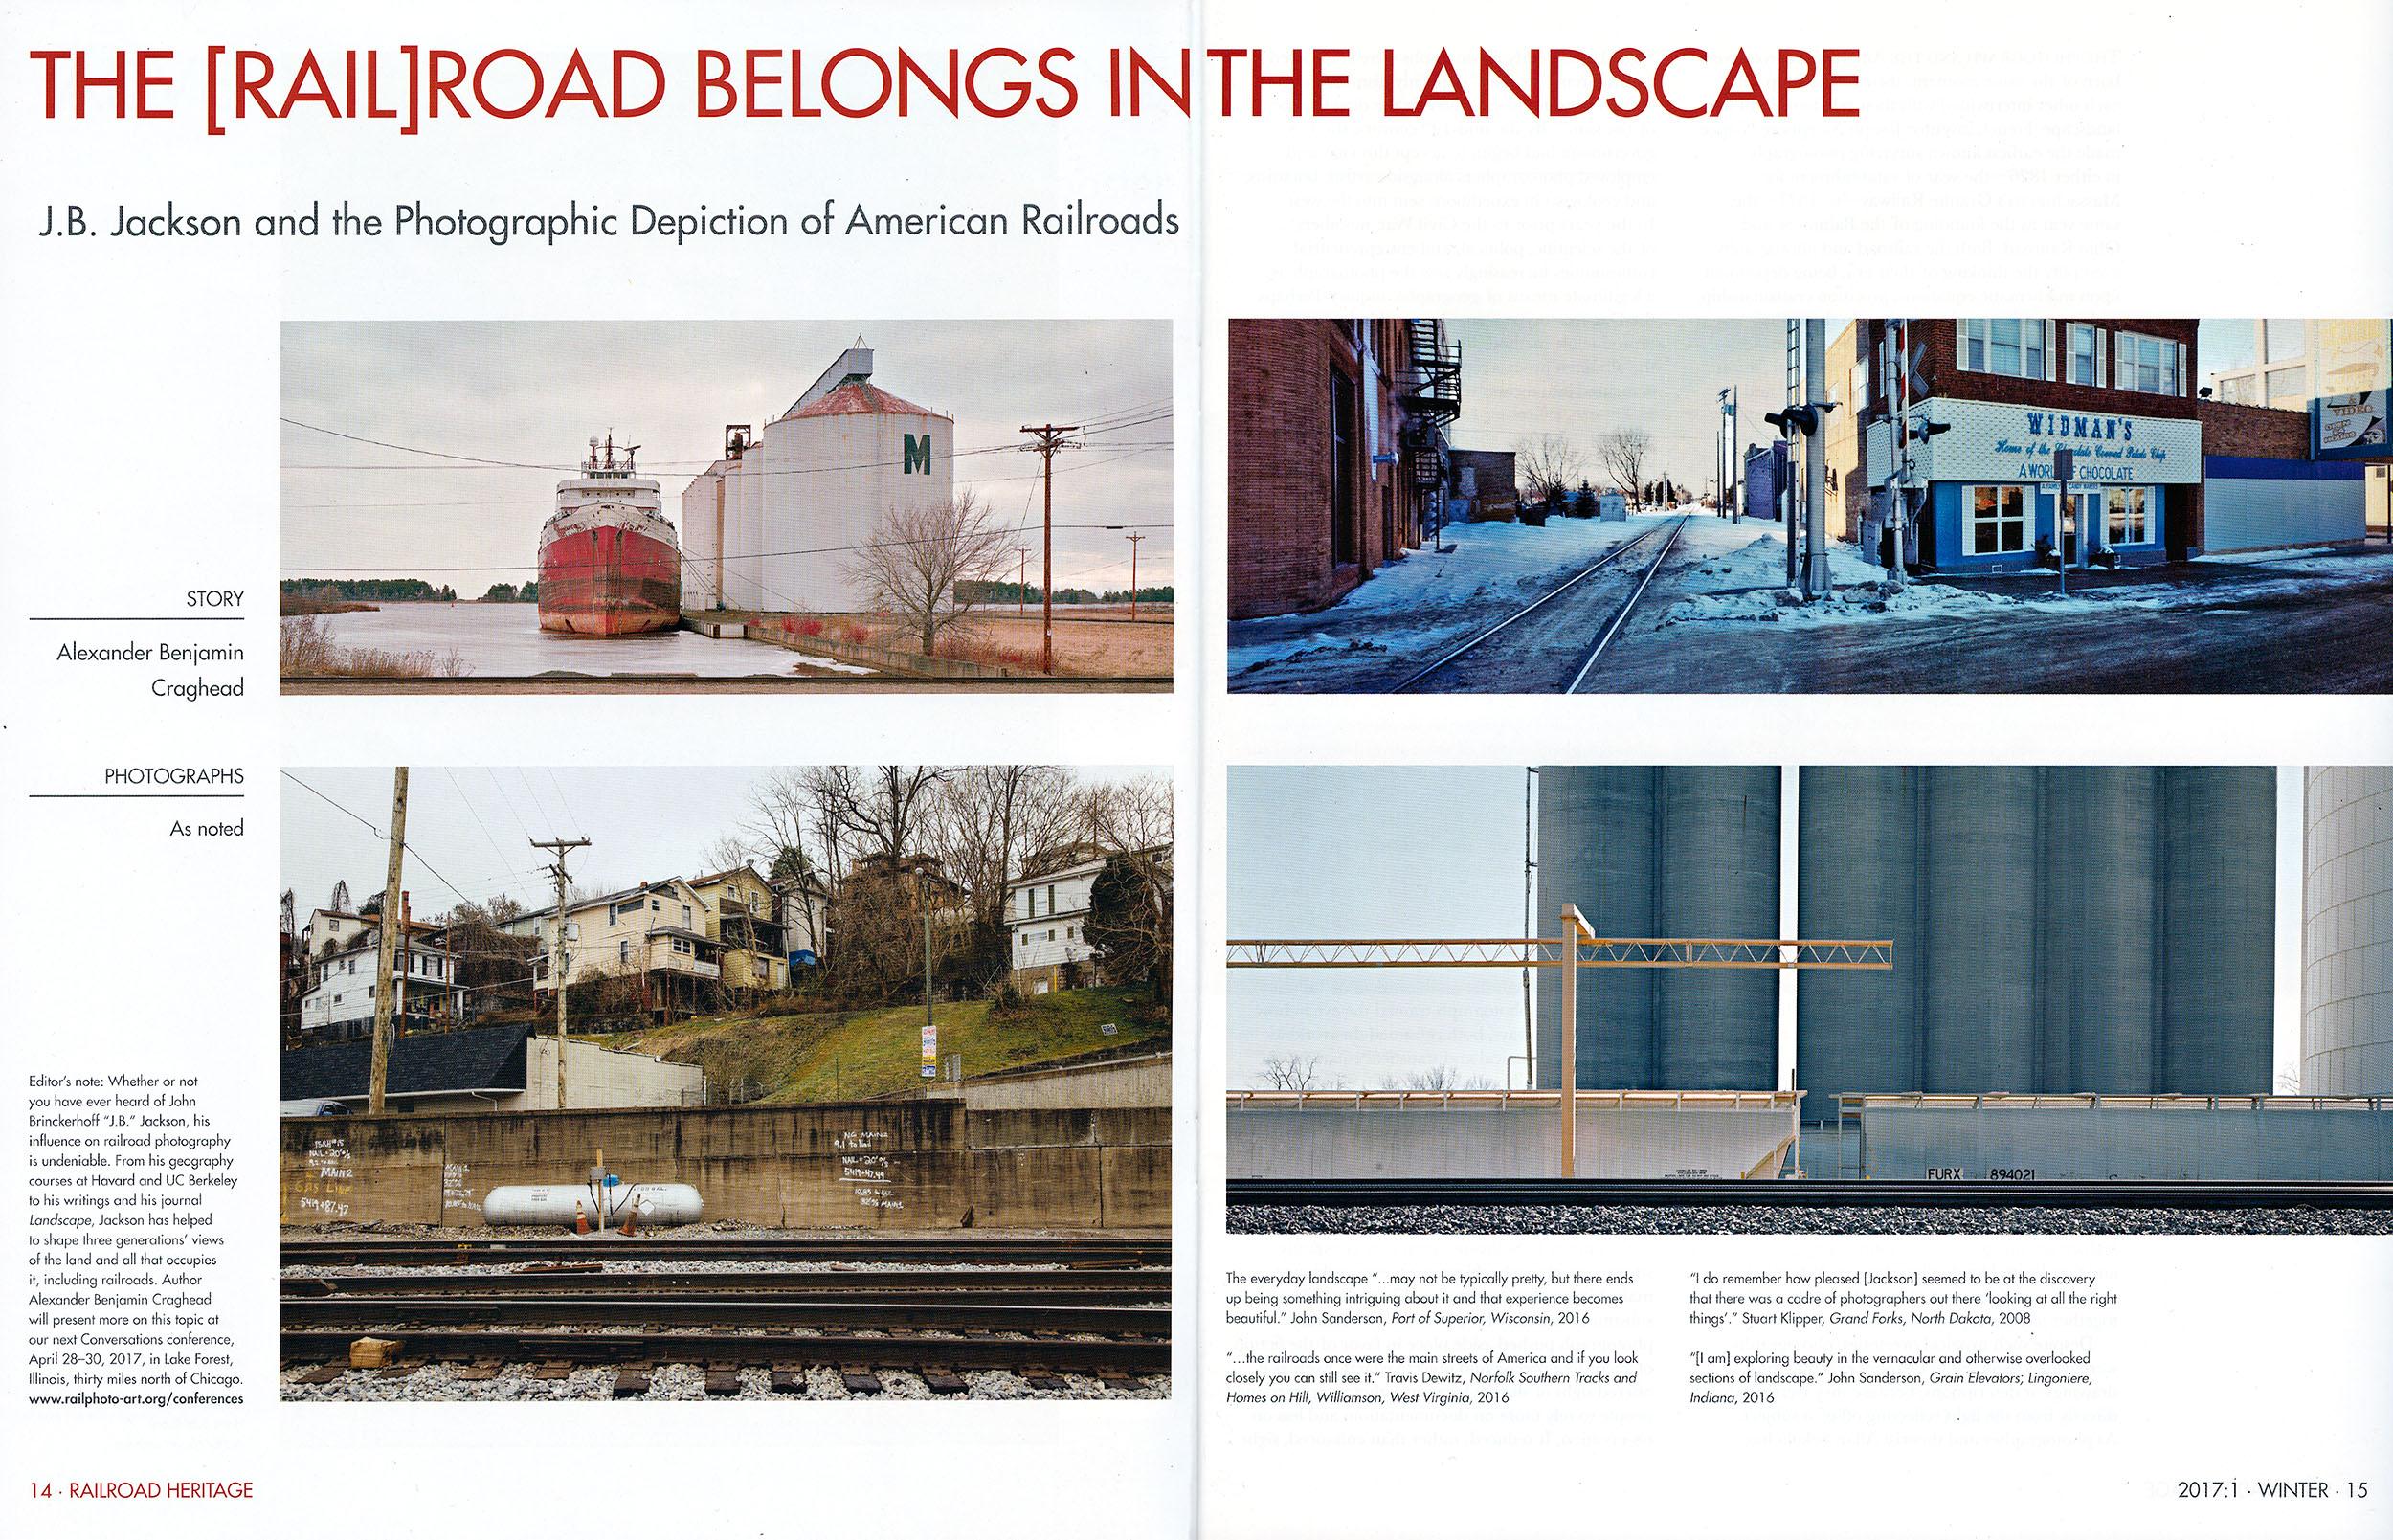 2017_Winter 2017, J.B. Jackson and the Railroad Landscape_Railroad Heritage.jpg